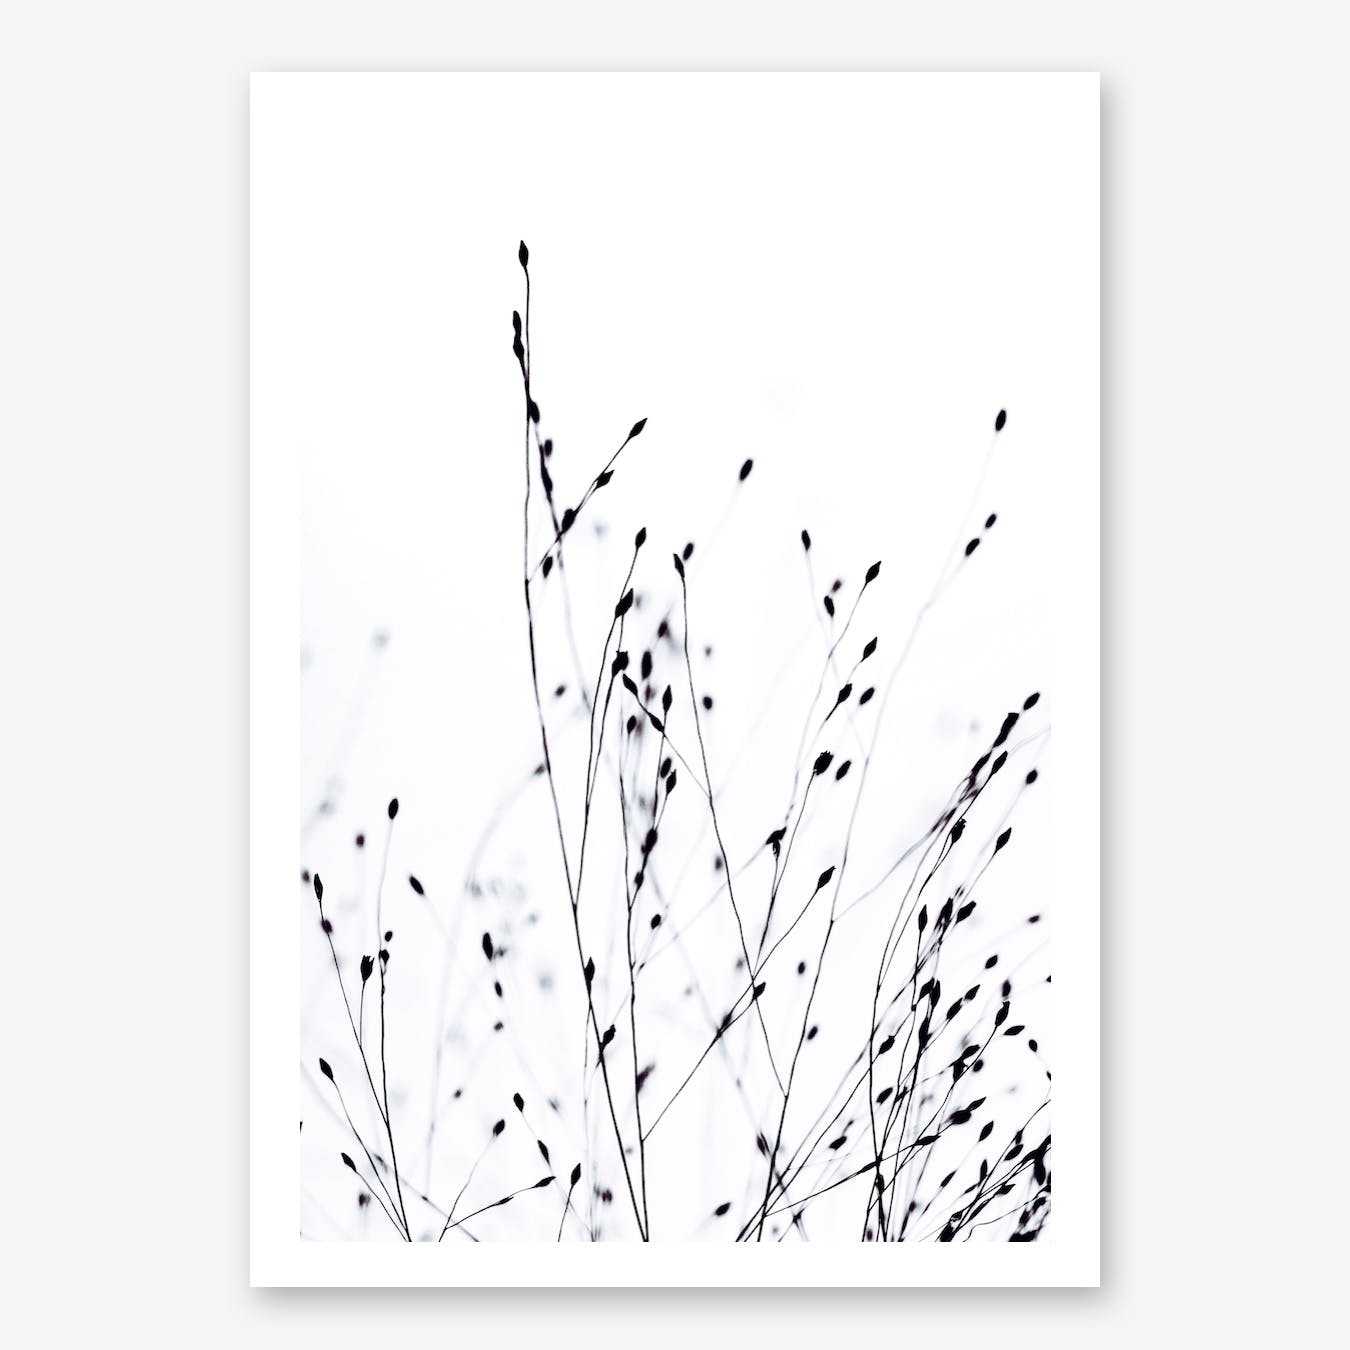 Black Grass in Print